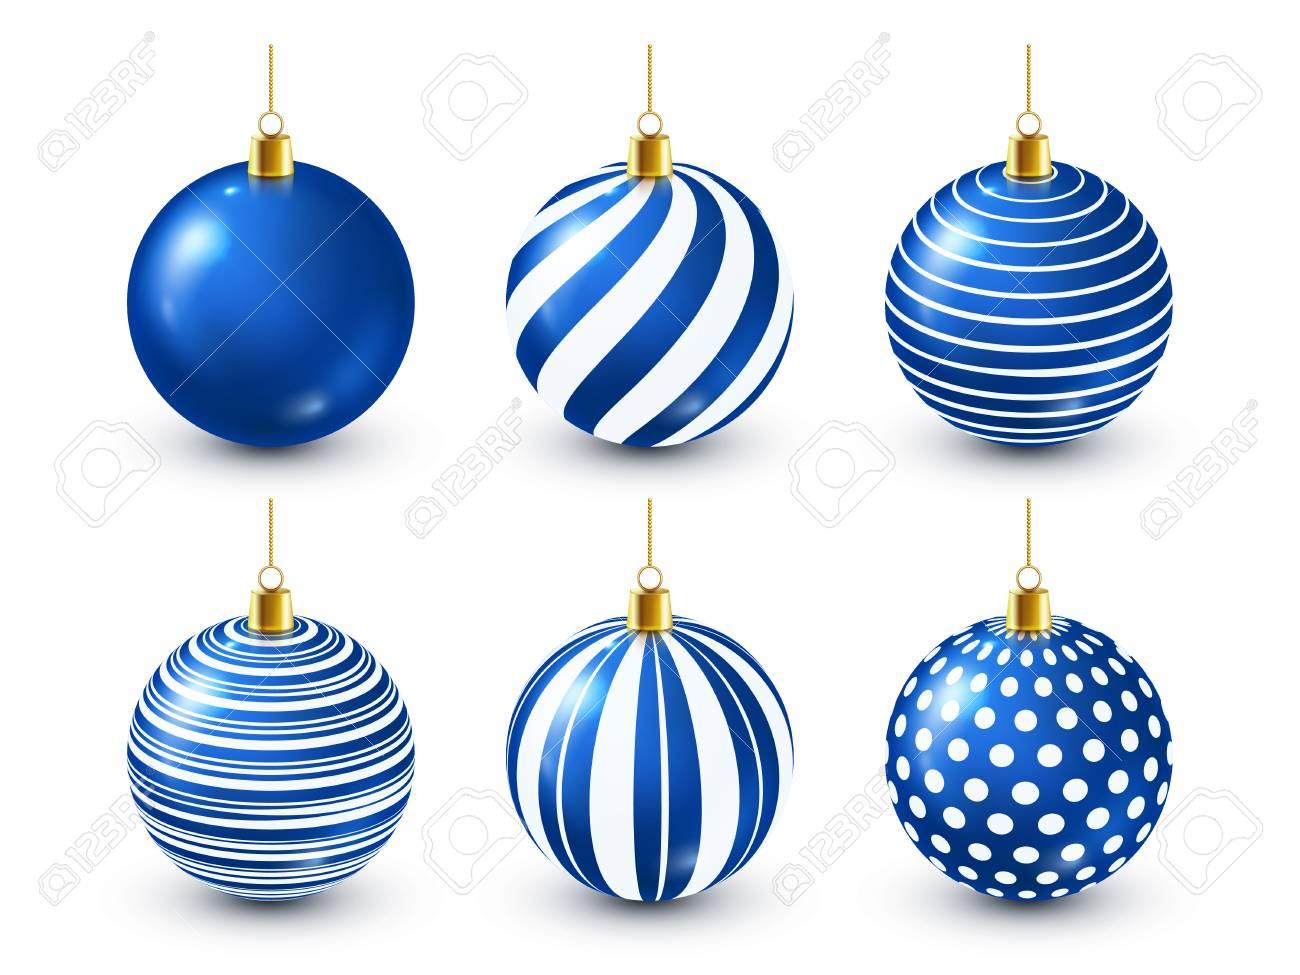 Christmas Tree Shiny Blue Balls Set. New Year Decoration. Winter Season. December Holidays. Greeting Gift Card Or Banner Element - 115591181